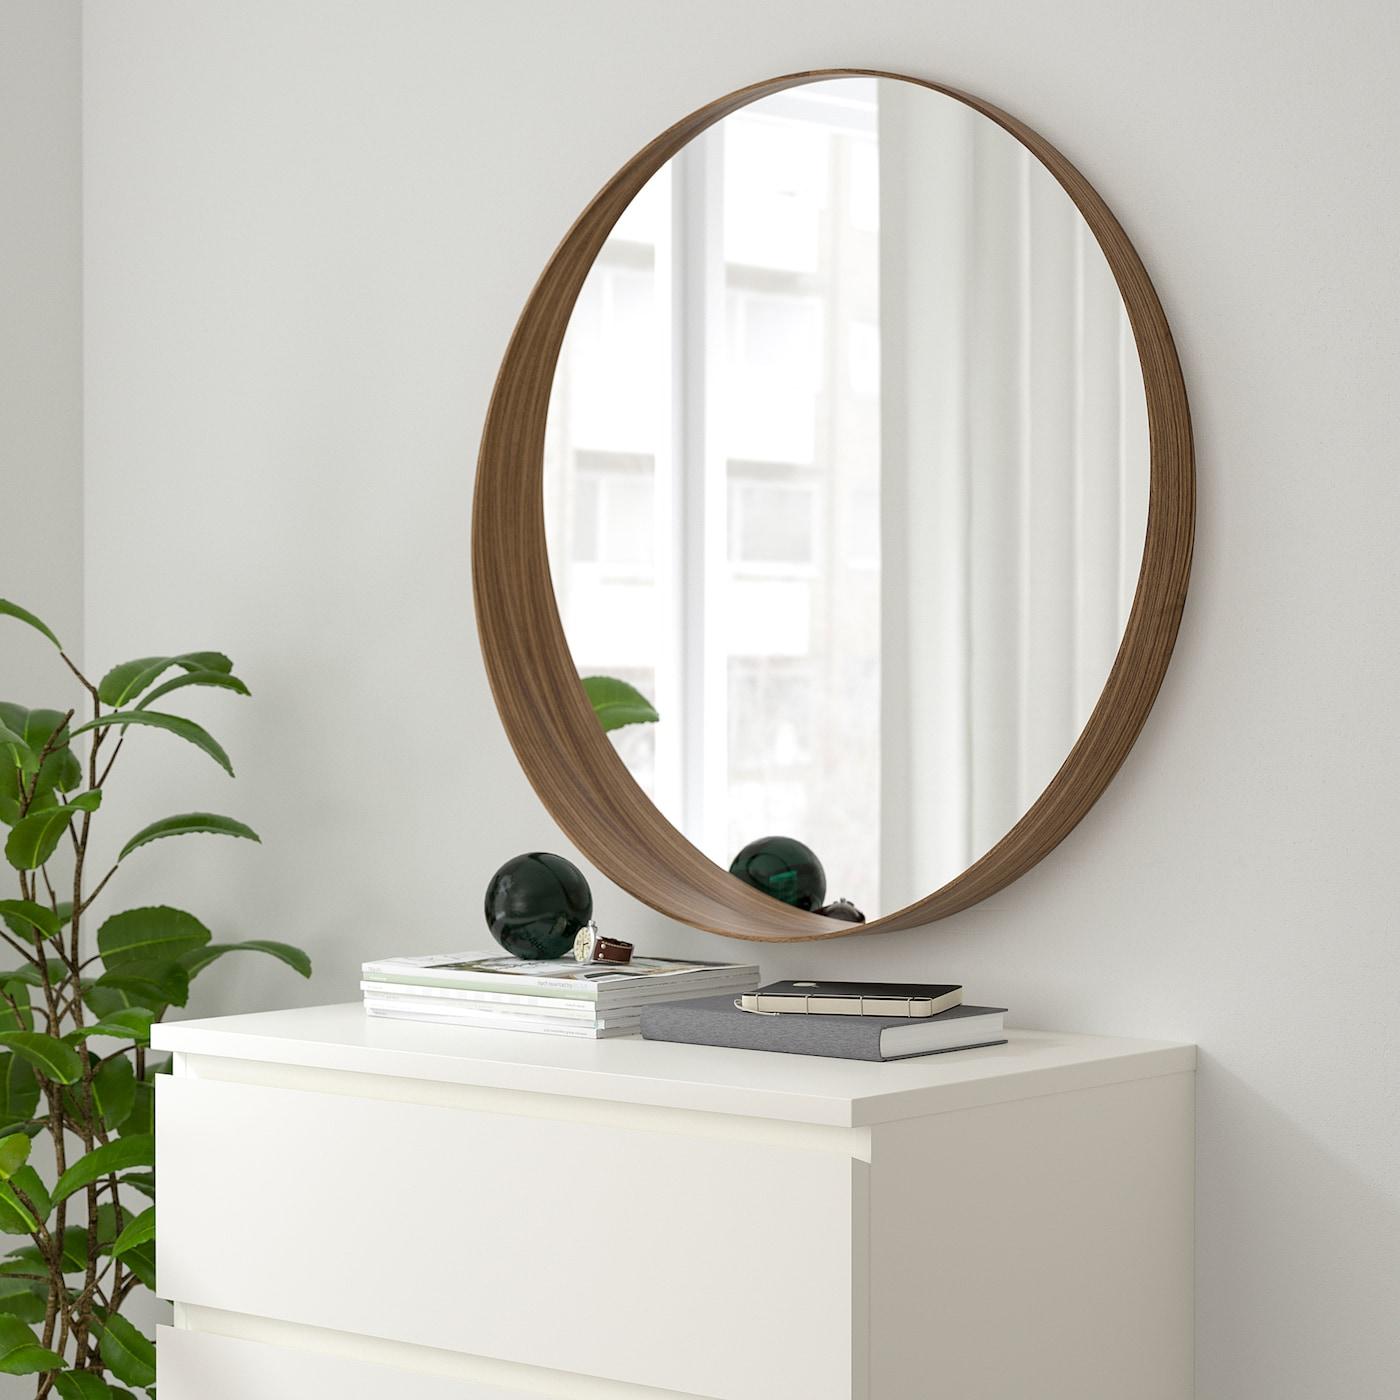 STOCKHOLM Mirror - walnut veneer 4 cm